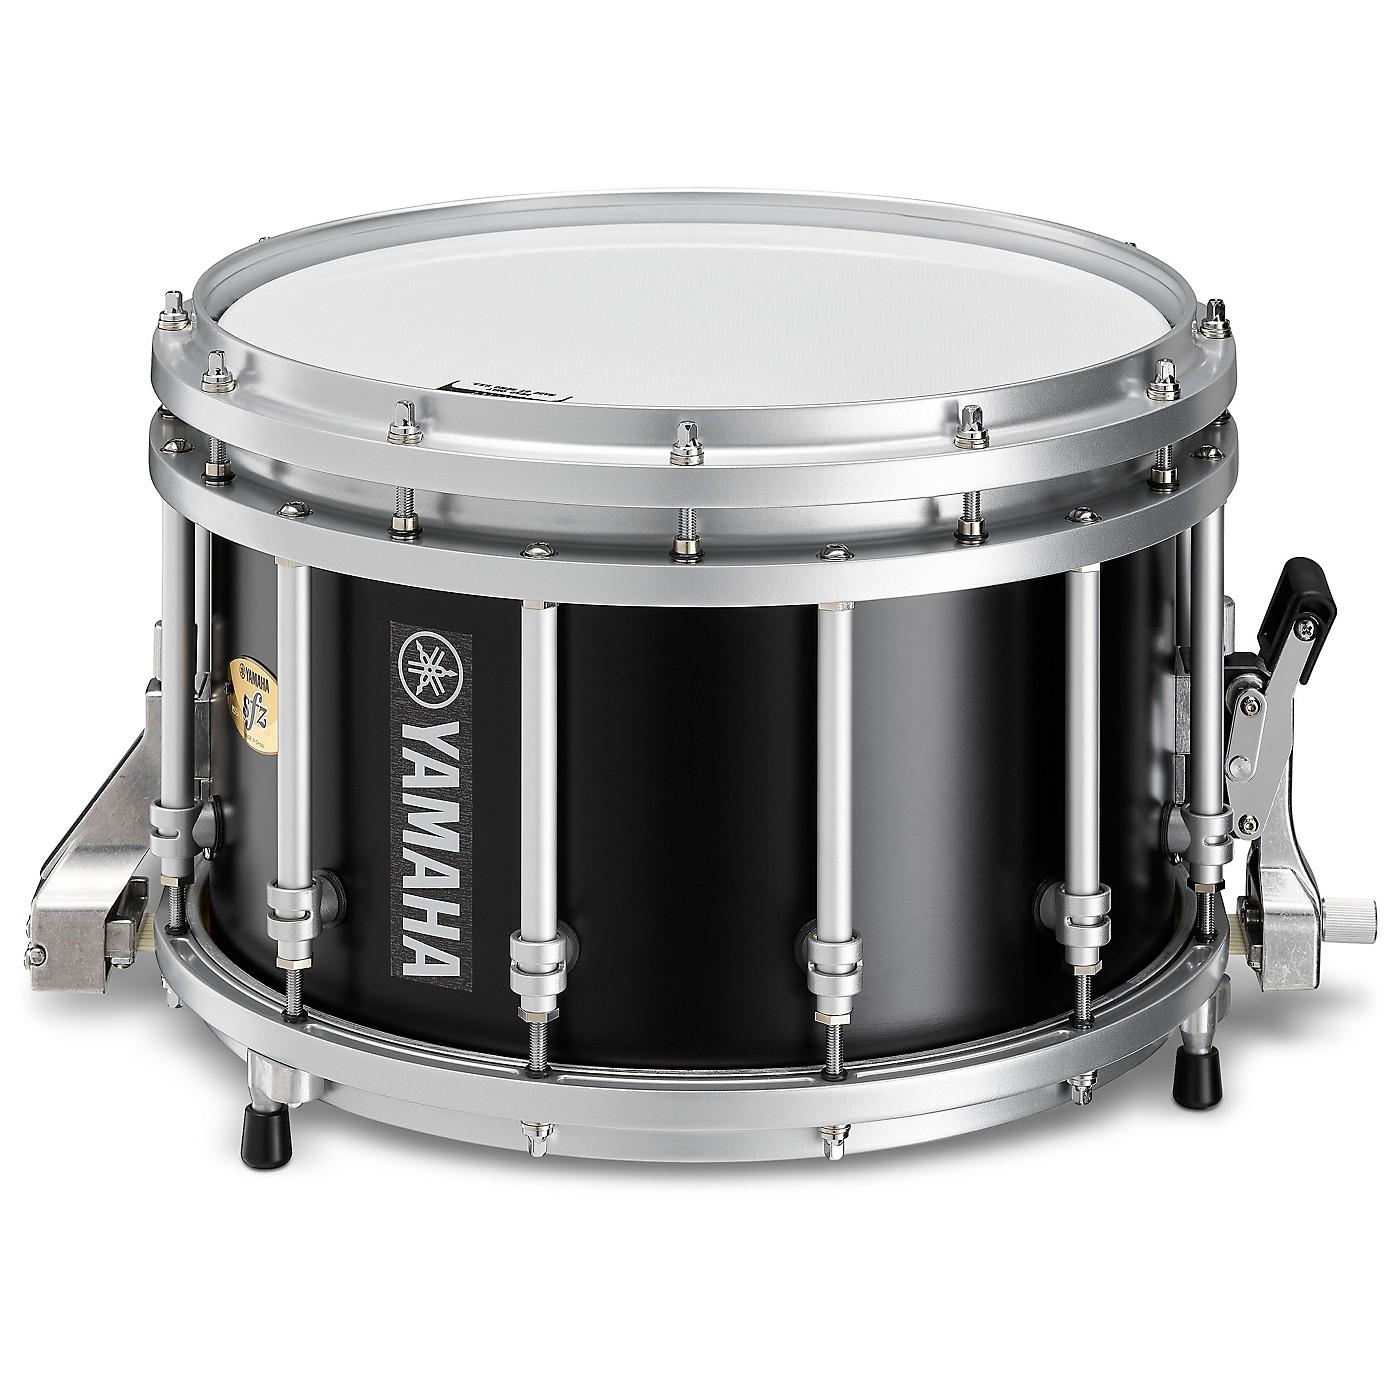 Yamaha 9400 SFZ Piccolo Marching Snare Drum thumbnail